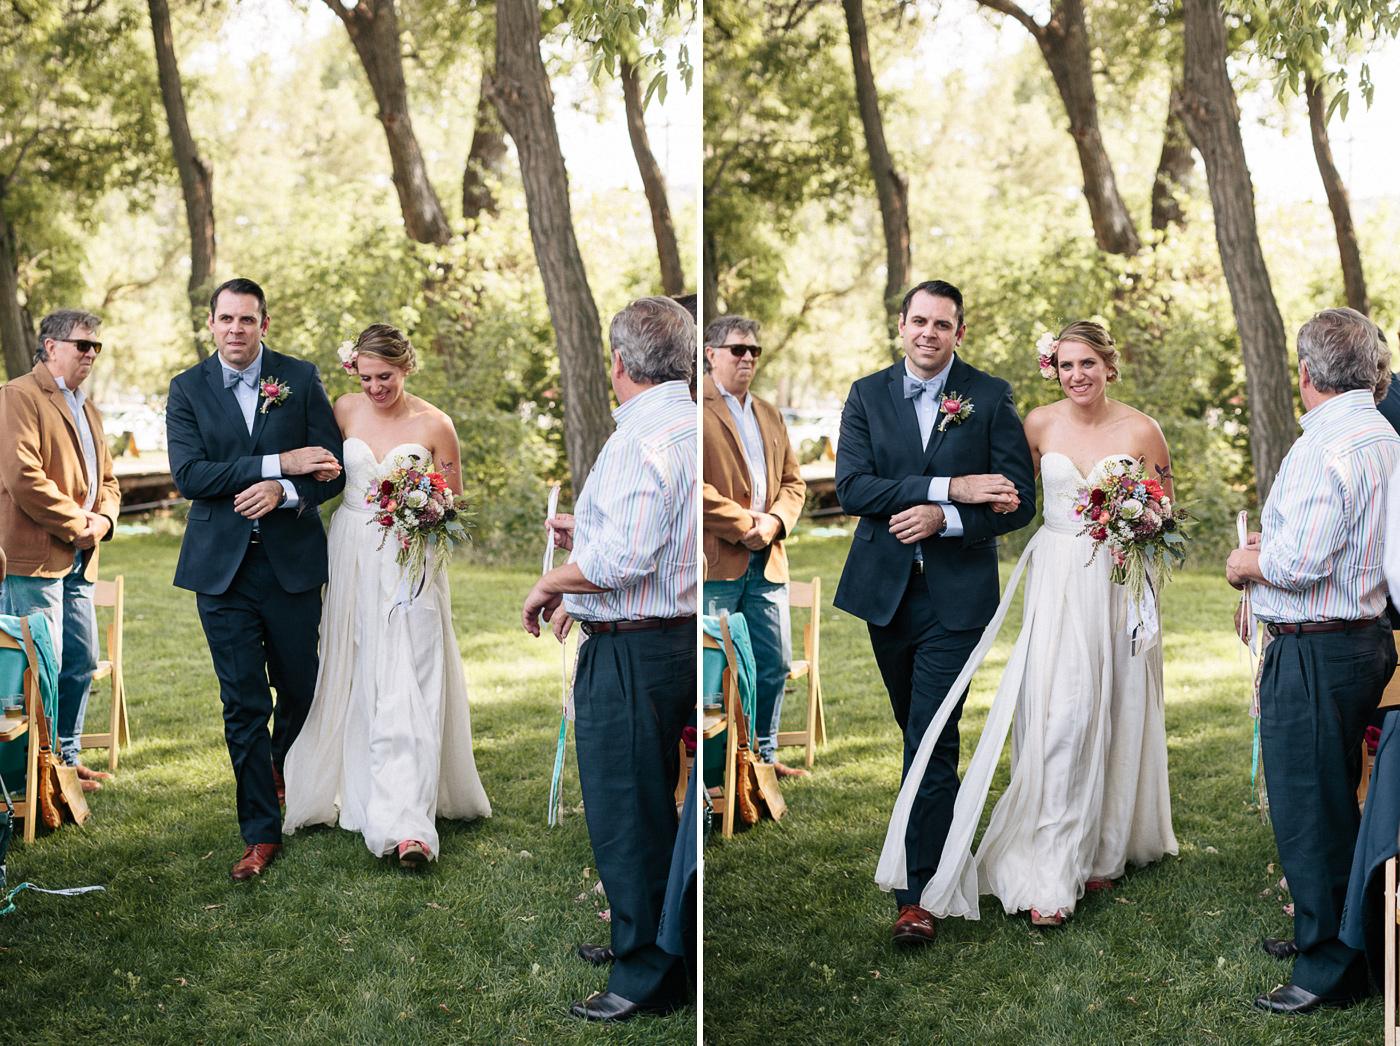 Lyons-Farmette-Wedding-Photographer-Lucy-Austin-Flash-Mob-Dance-18.jpg